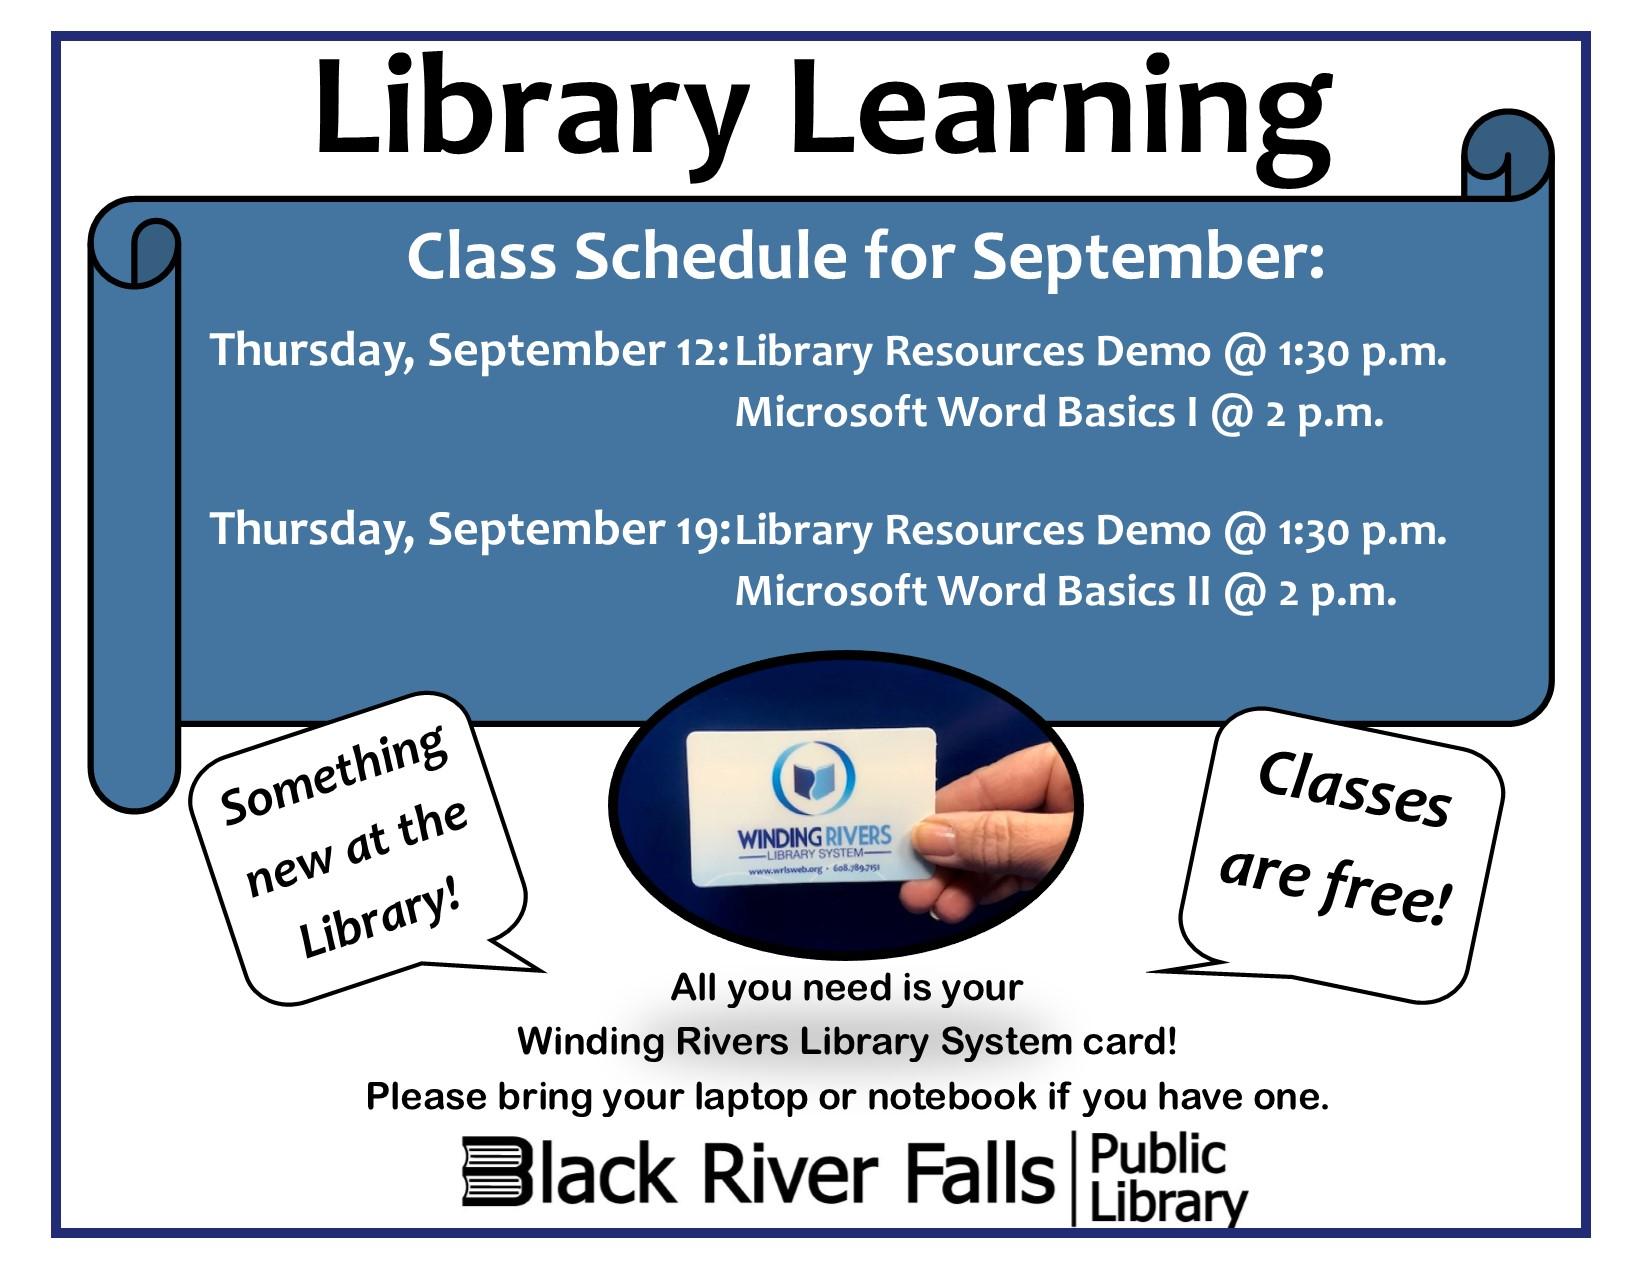 Black River Falls Library